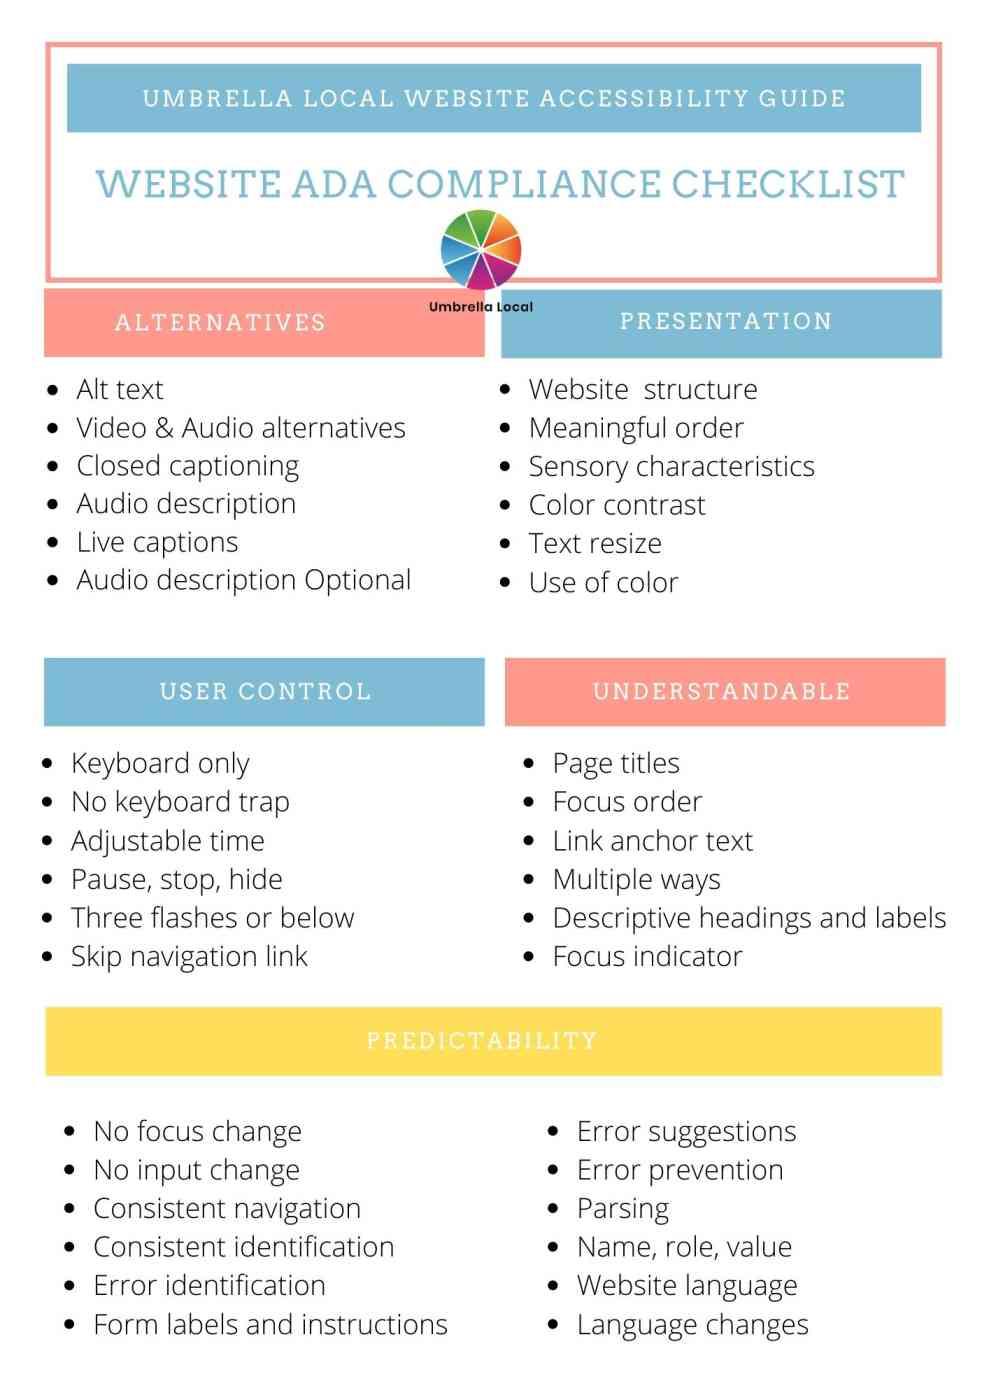 website ADA compliance checklist